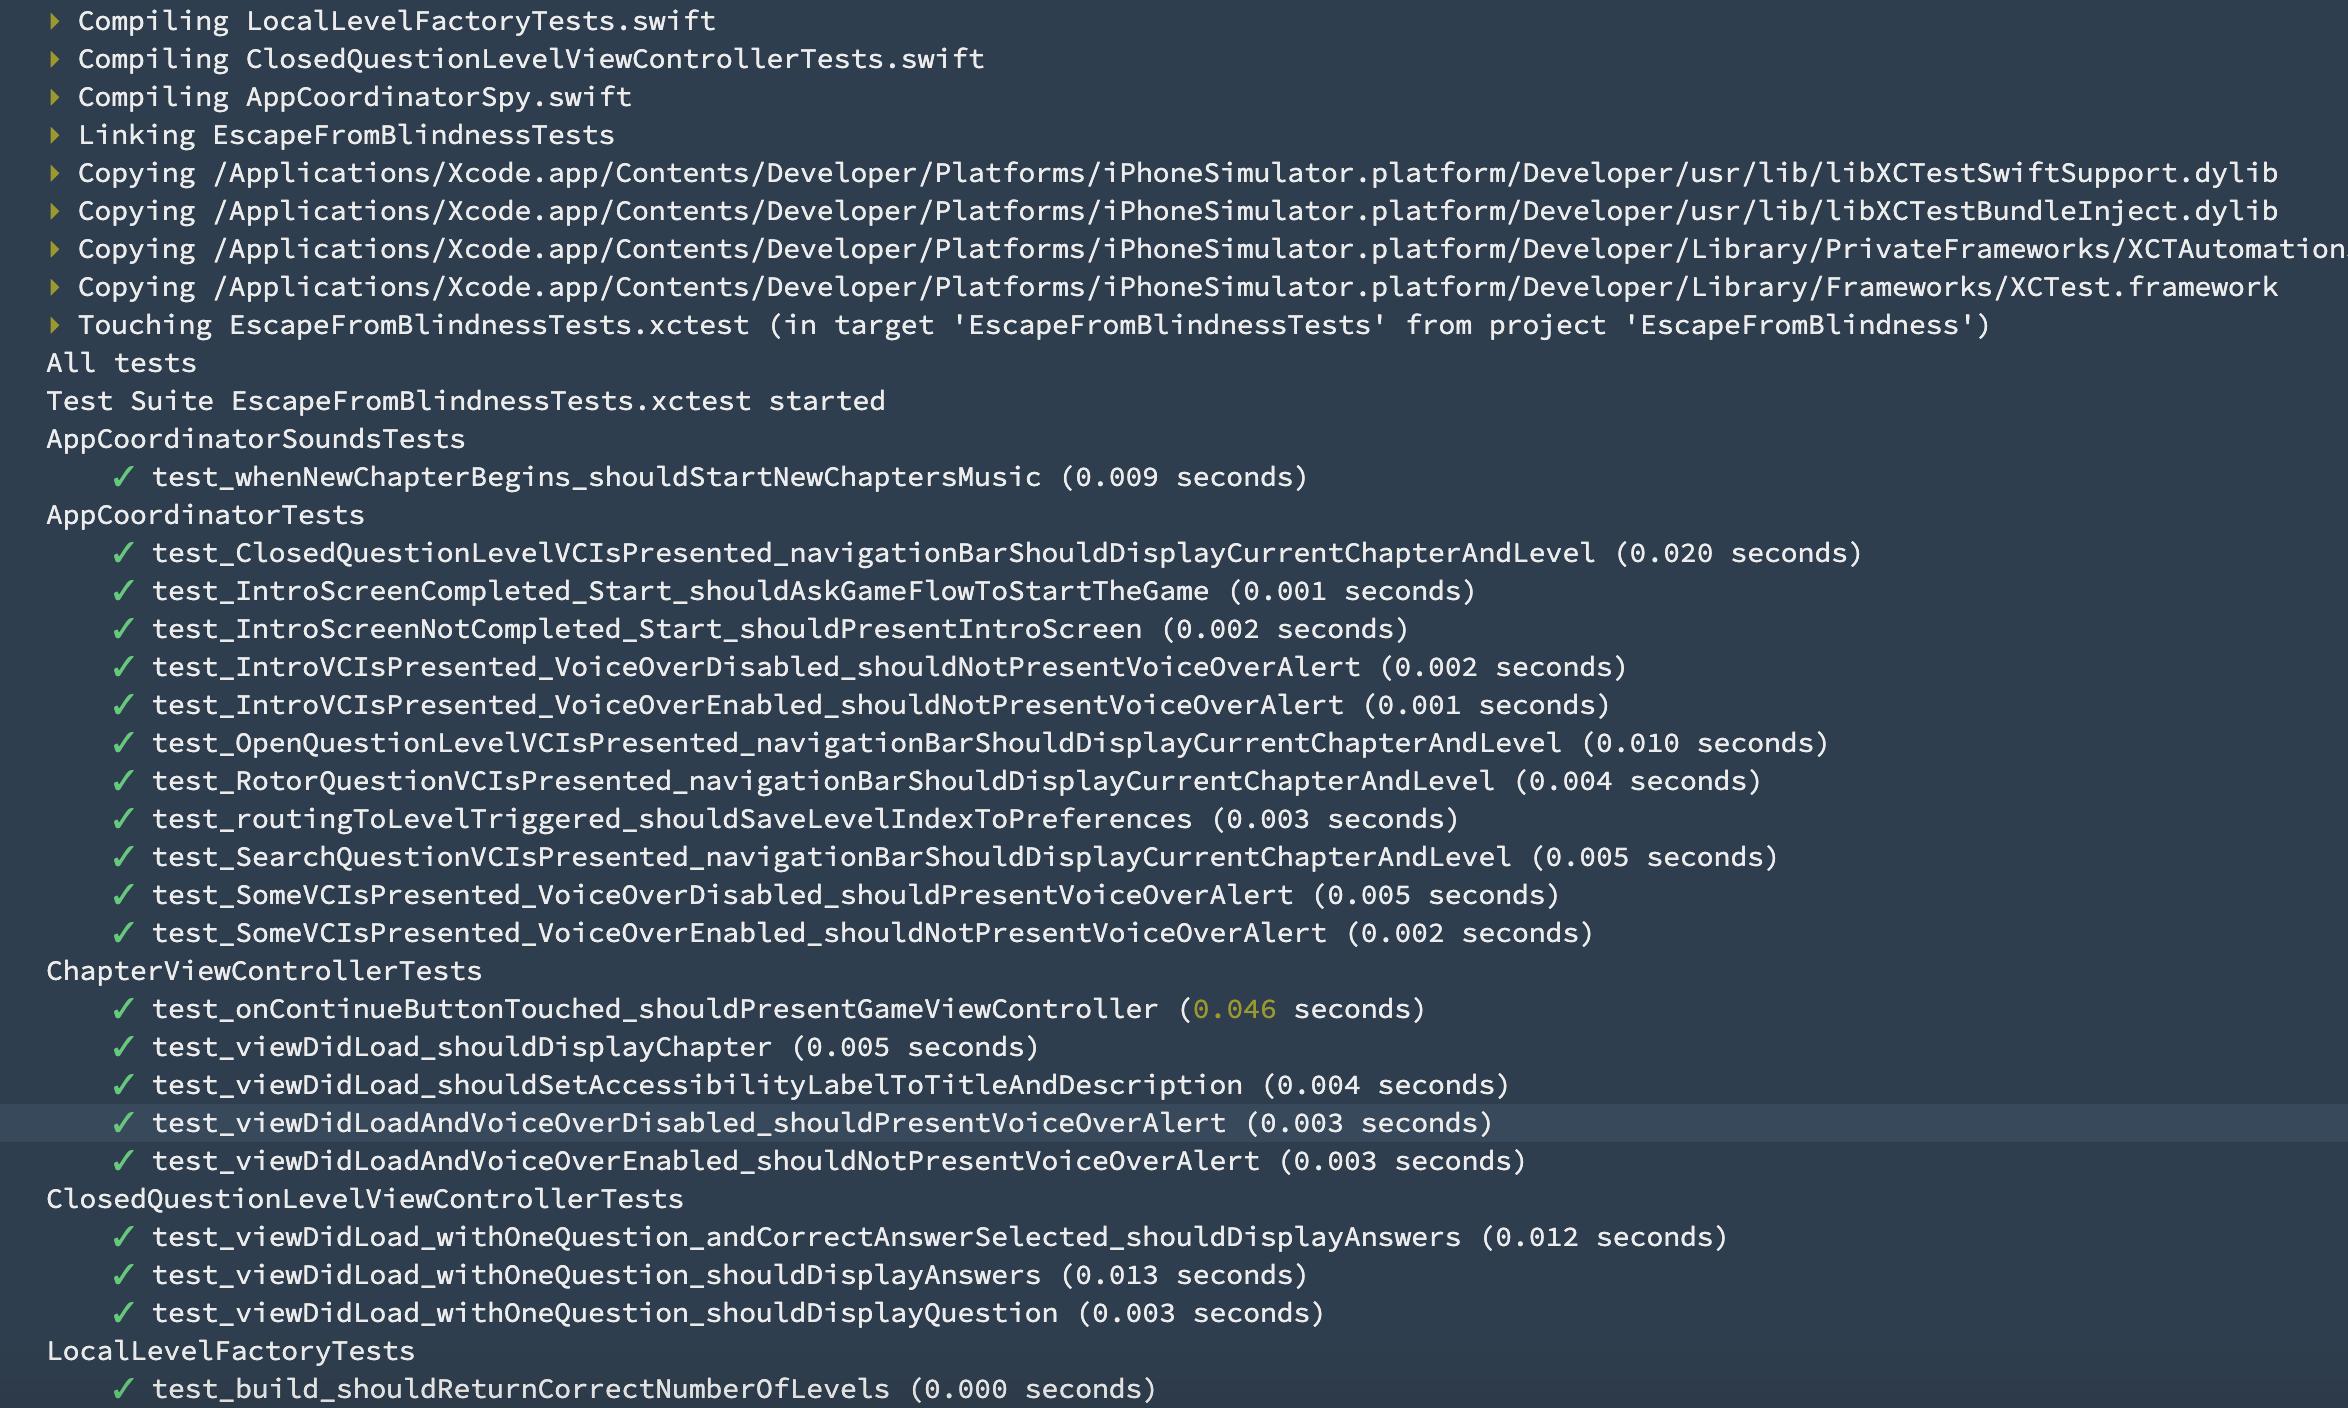 Bitrise continuous integration tool pipeline logs